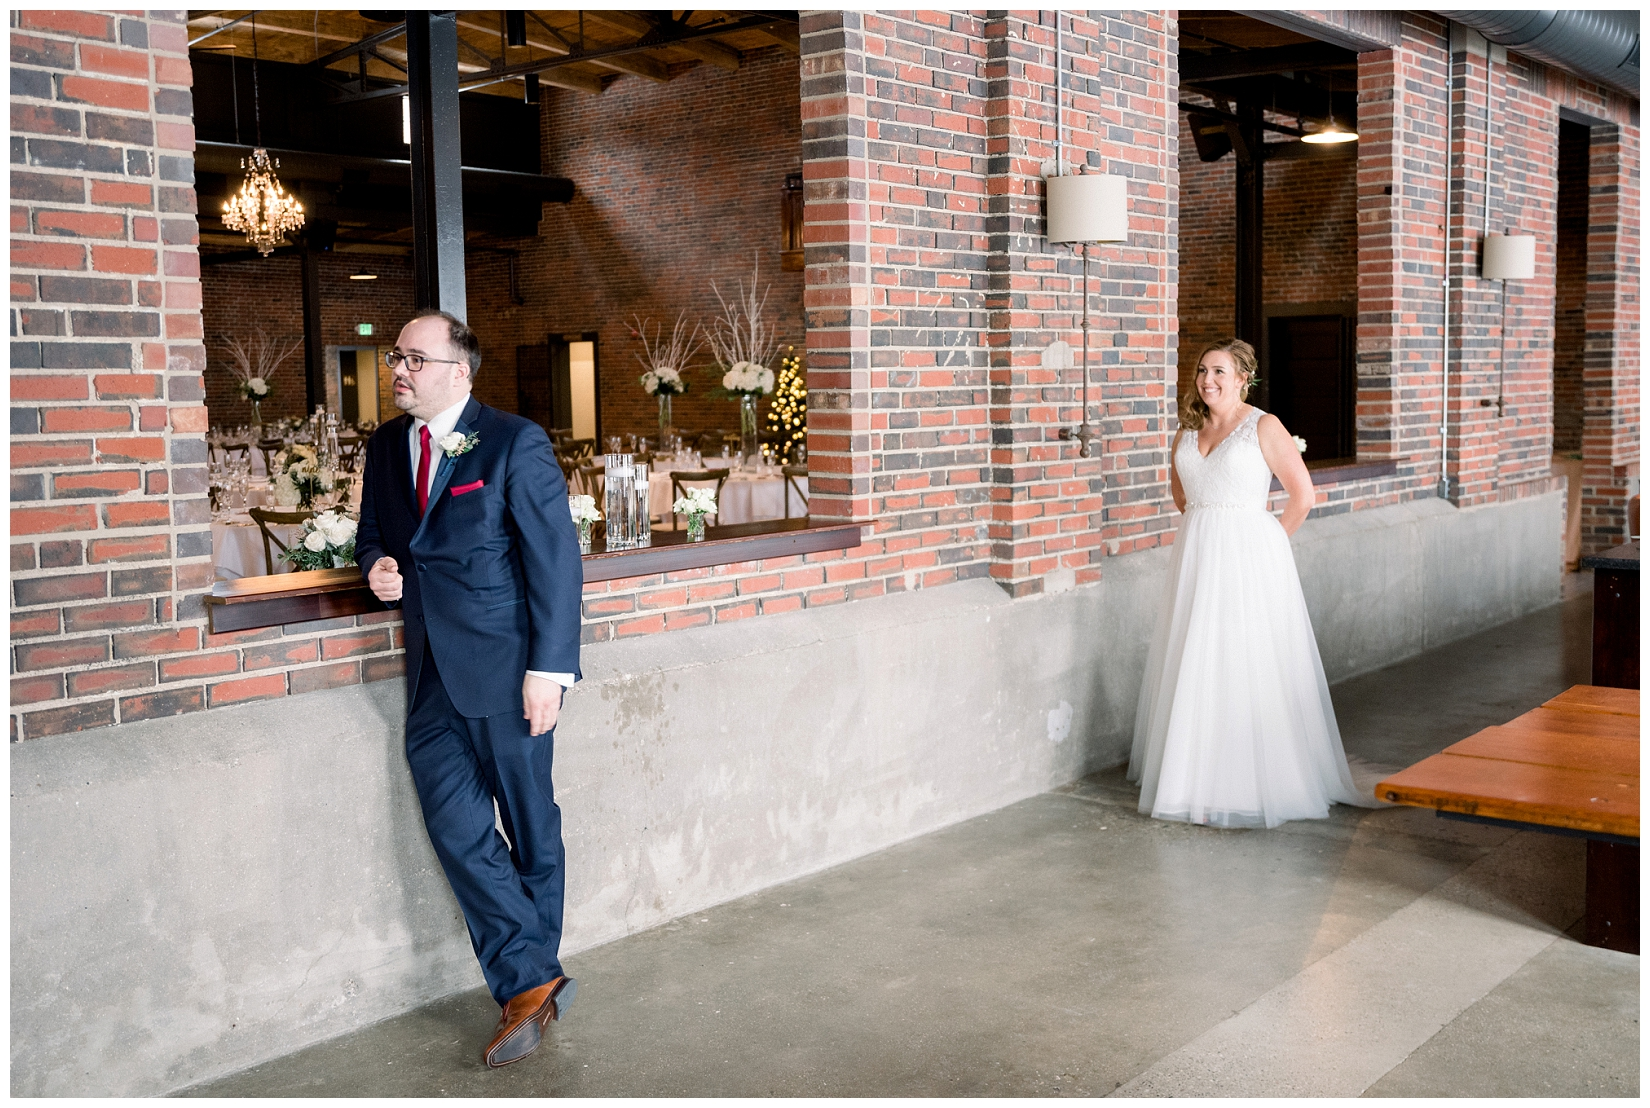 cat-alkire-wedding-photographer-indiana-chicago-indianapolis-fort-wayne_0936.jpg